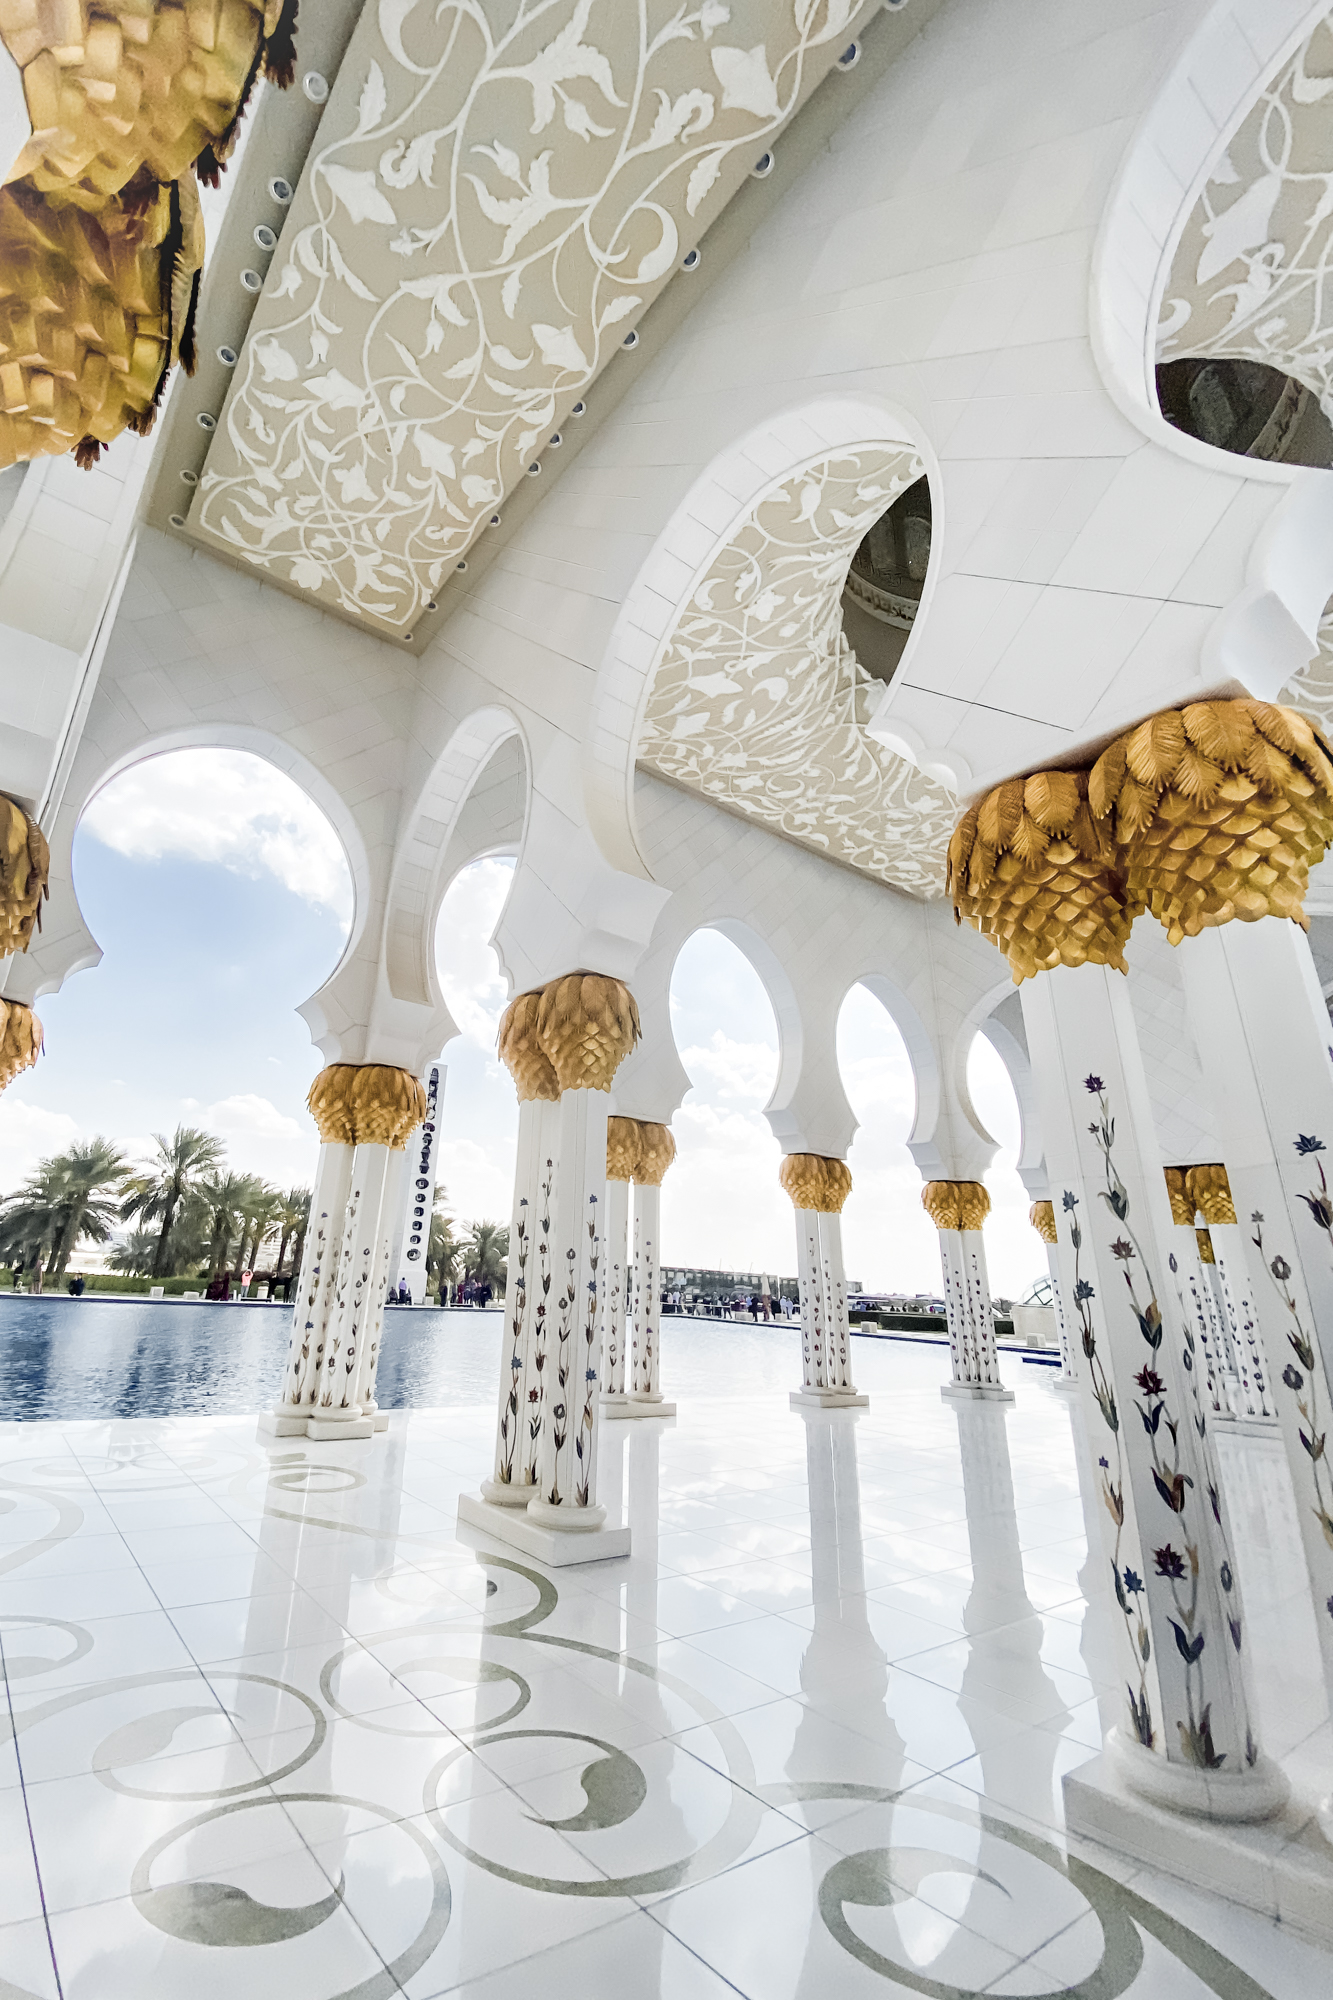 Abu Dhabi: 5 meilleures choses à faire